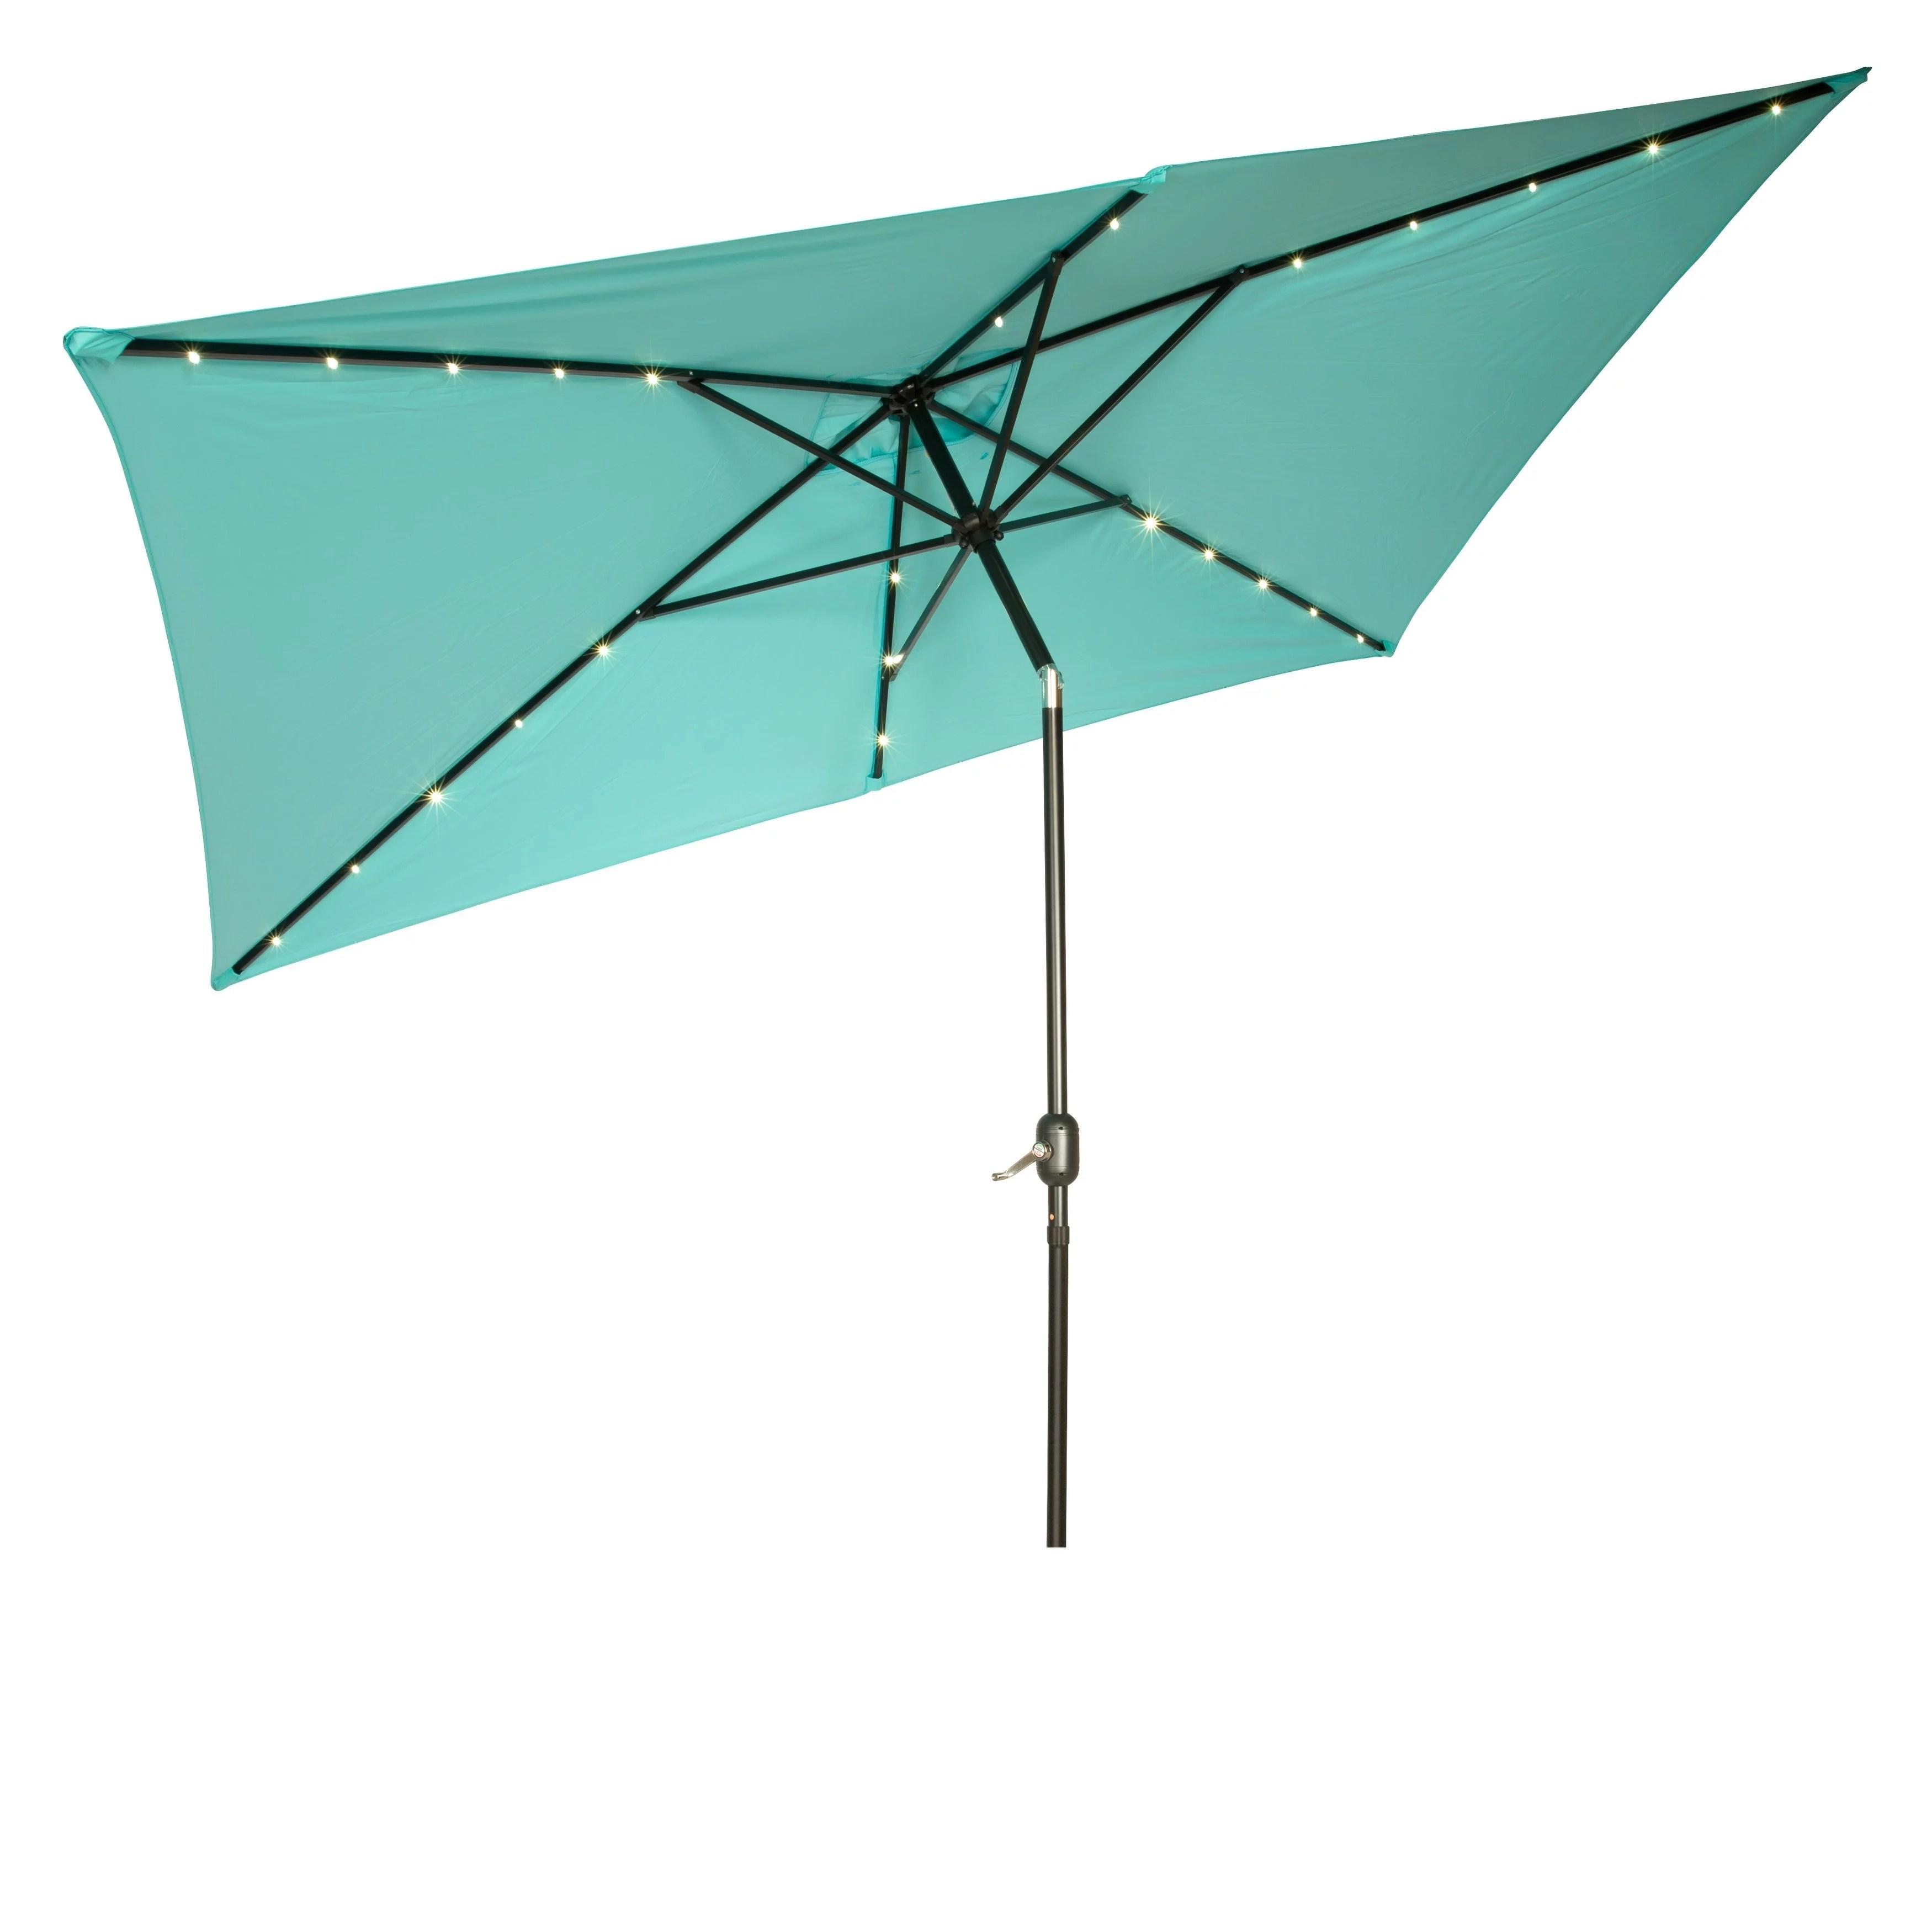 rectangular solar powered led lighted patio umbrella 10 x 6 5 by trademark innovations teal walmart com